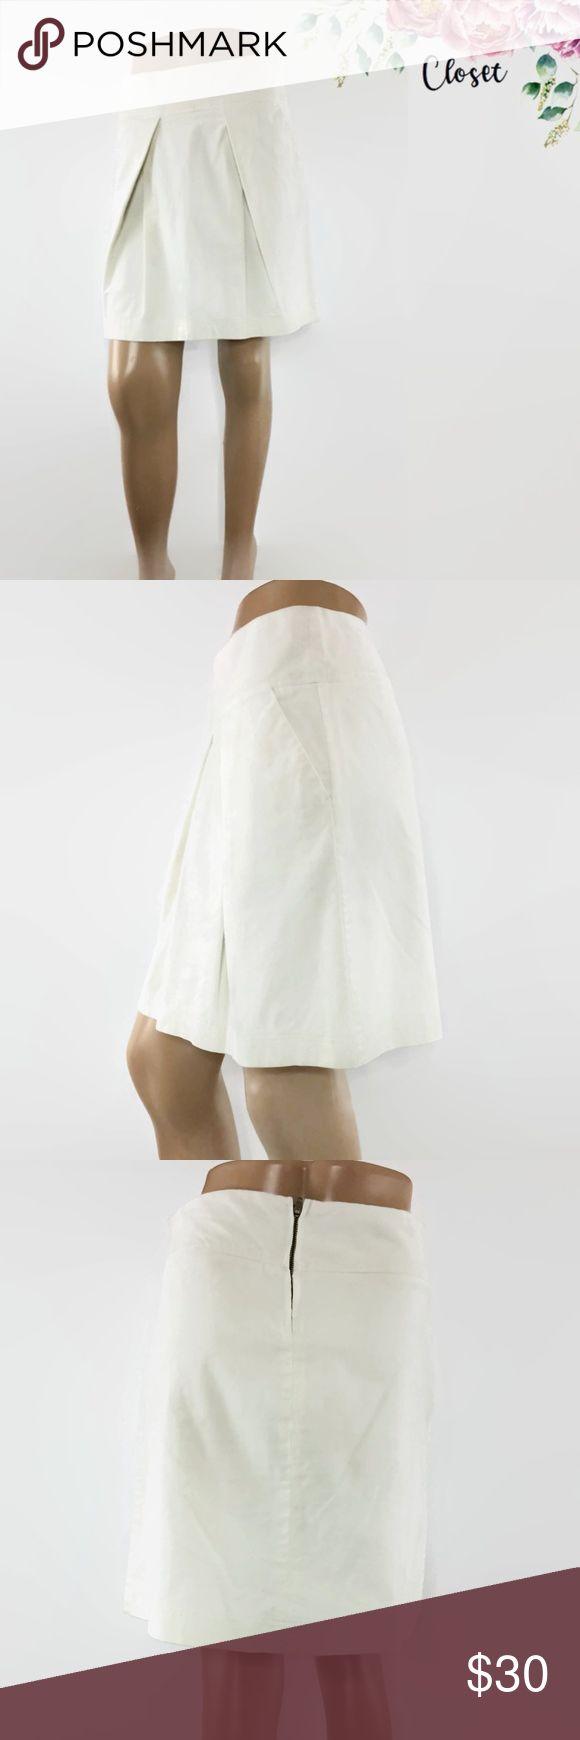 UCB United Colors of Benetton Cord Pleated Skirt Like New   United Colors of Benetton White Super Soft Corduroy Pleated Skirt  Size 40 = US 6  Waist 30' Length 19'  98% Cotton 2% Elastan United Colors Of Benetton Skirts Mini